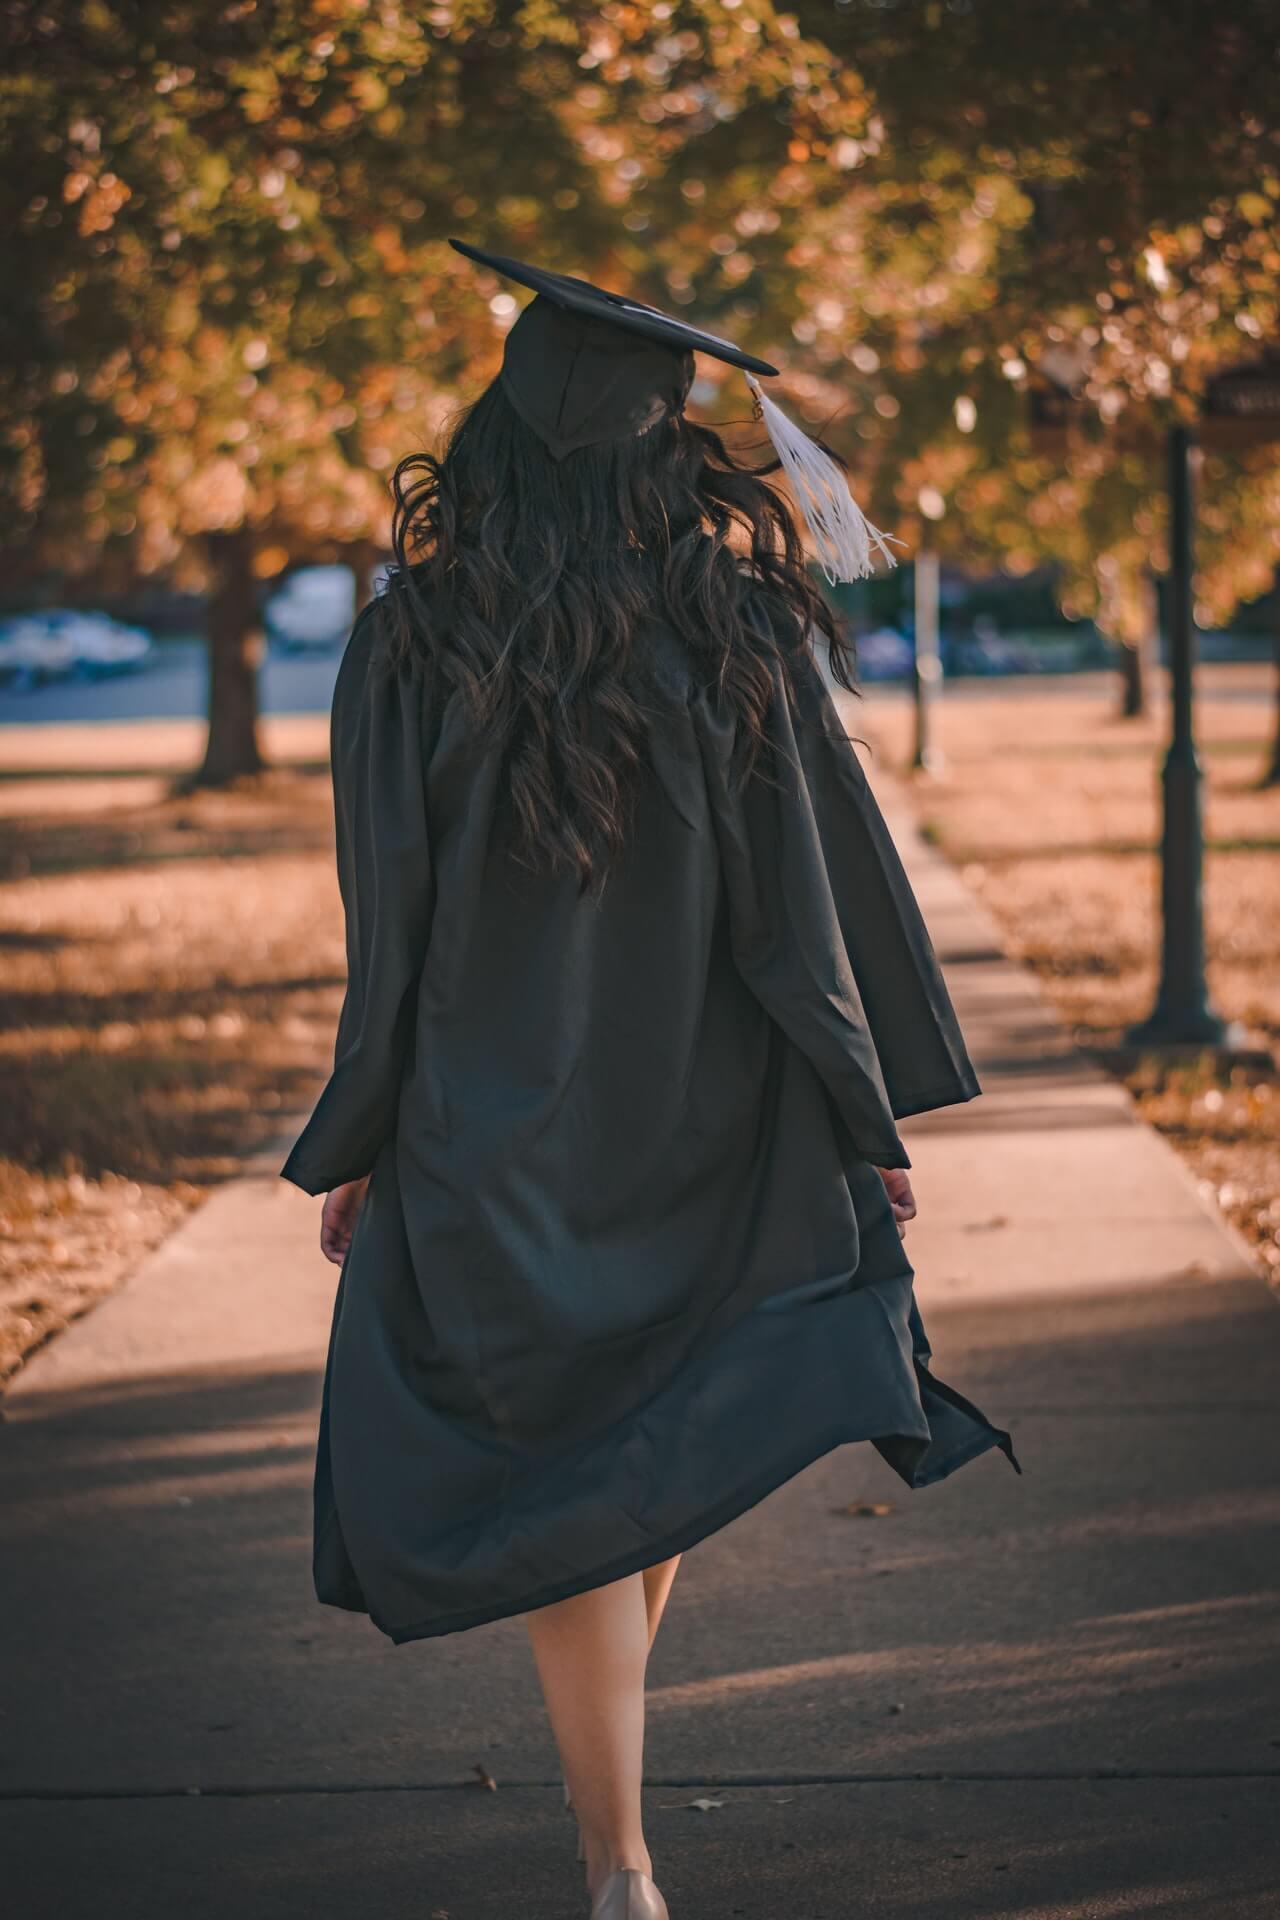 girl walking with graduation cap